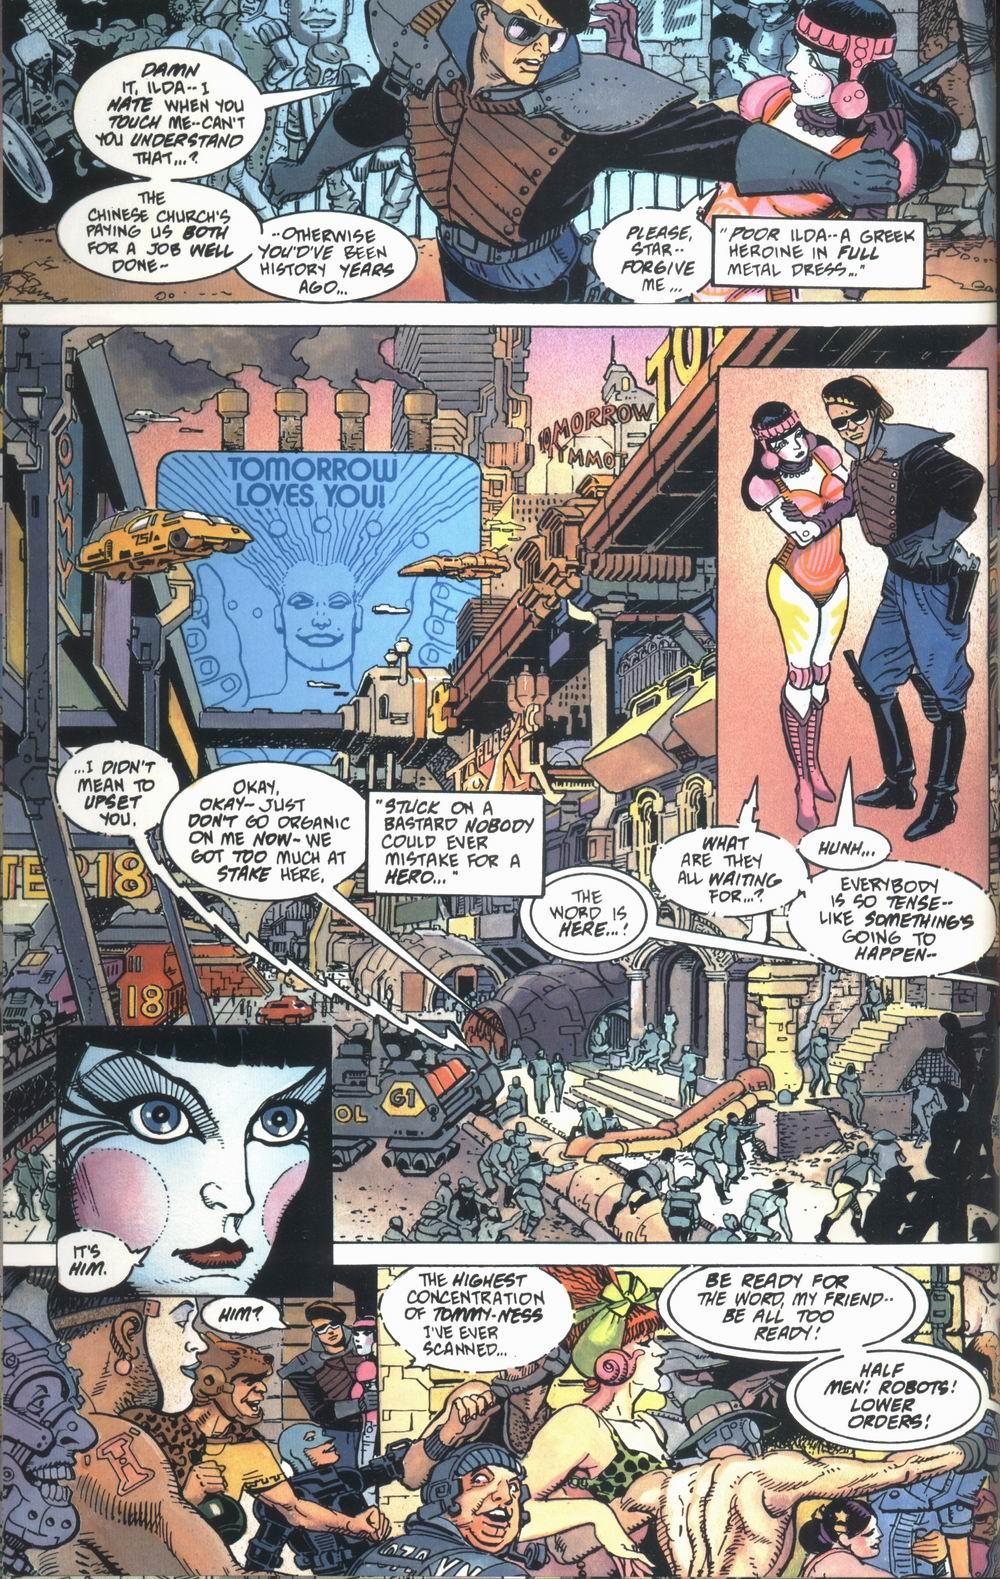 Read online Twilight comic -  Issue #3 - 8